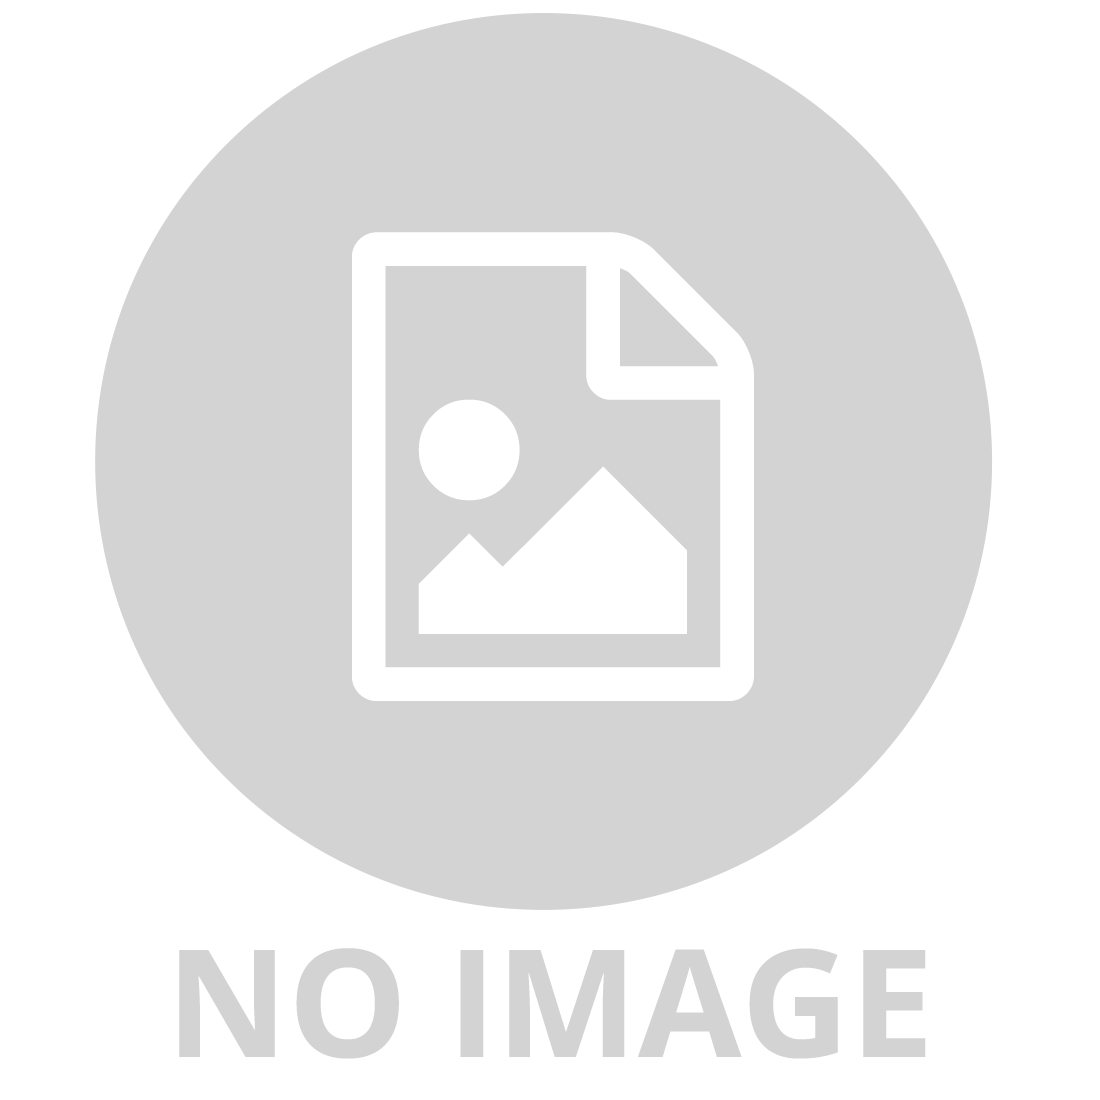 TOMY TOOMIES PIRATE BATH SHIP